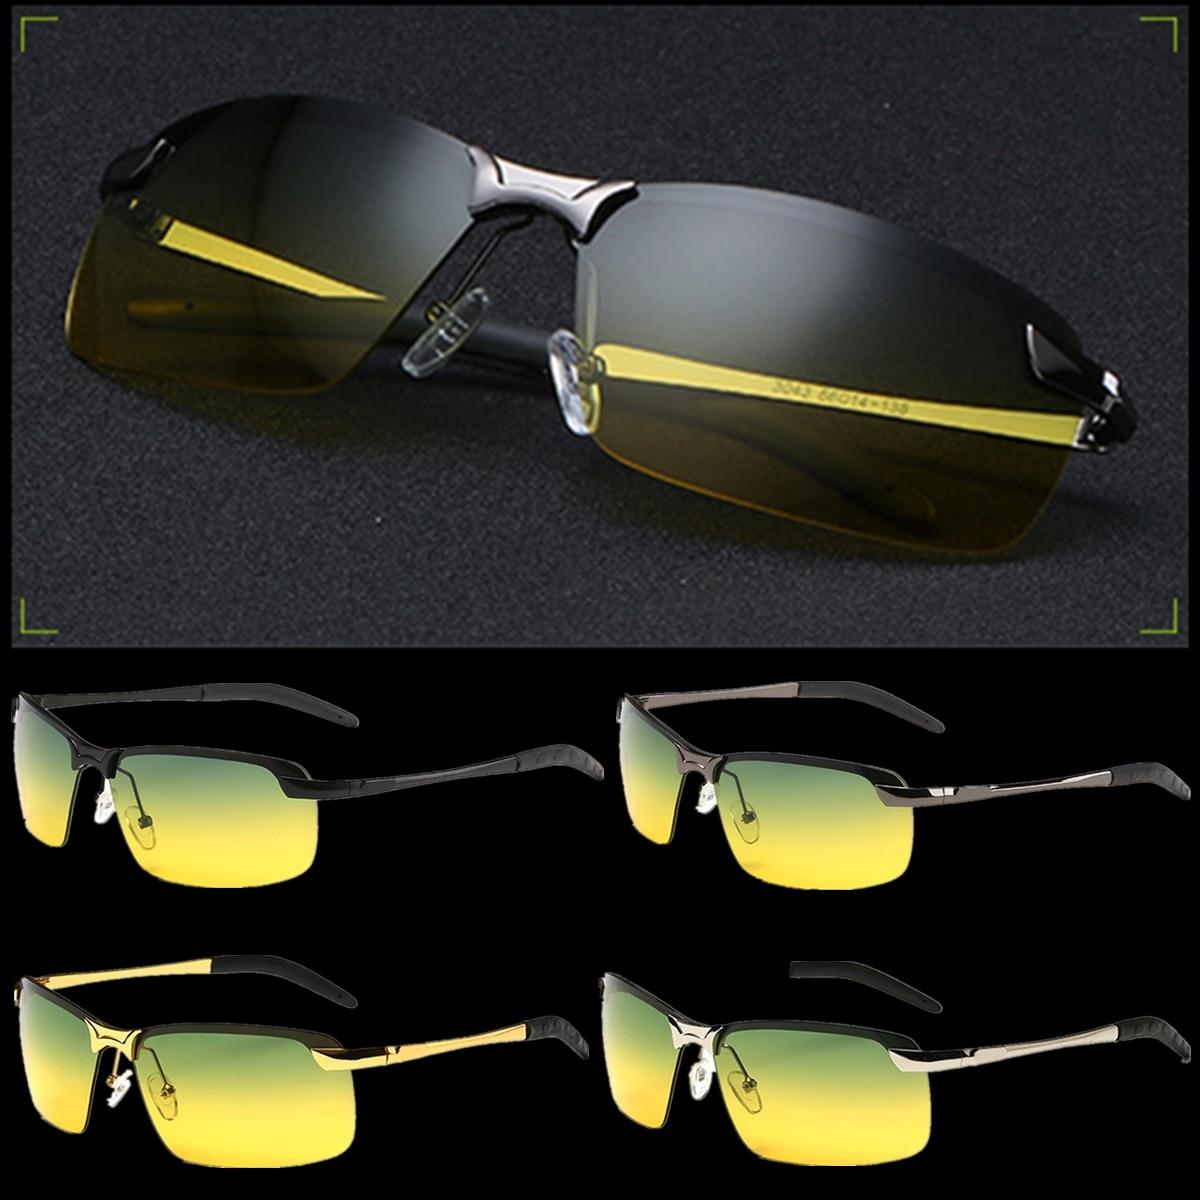 Men Night Driving Glasses Anti-Glare Yellow Sunglasses Eyewear Metal Night Goggles Protection Polarized Glasses For Car Driving